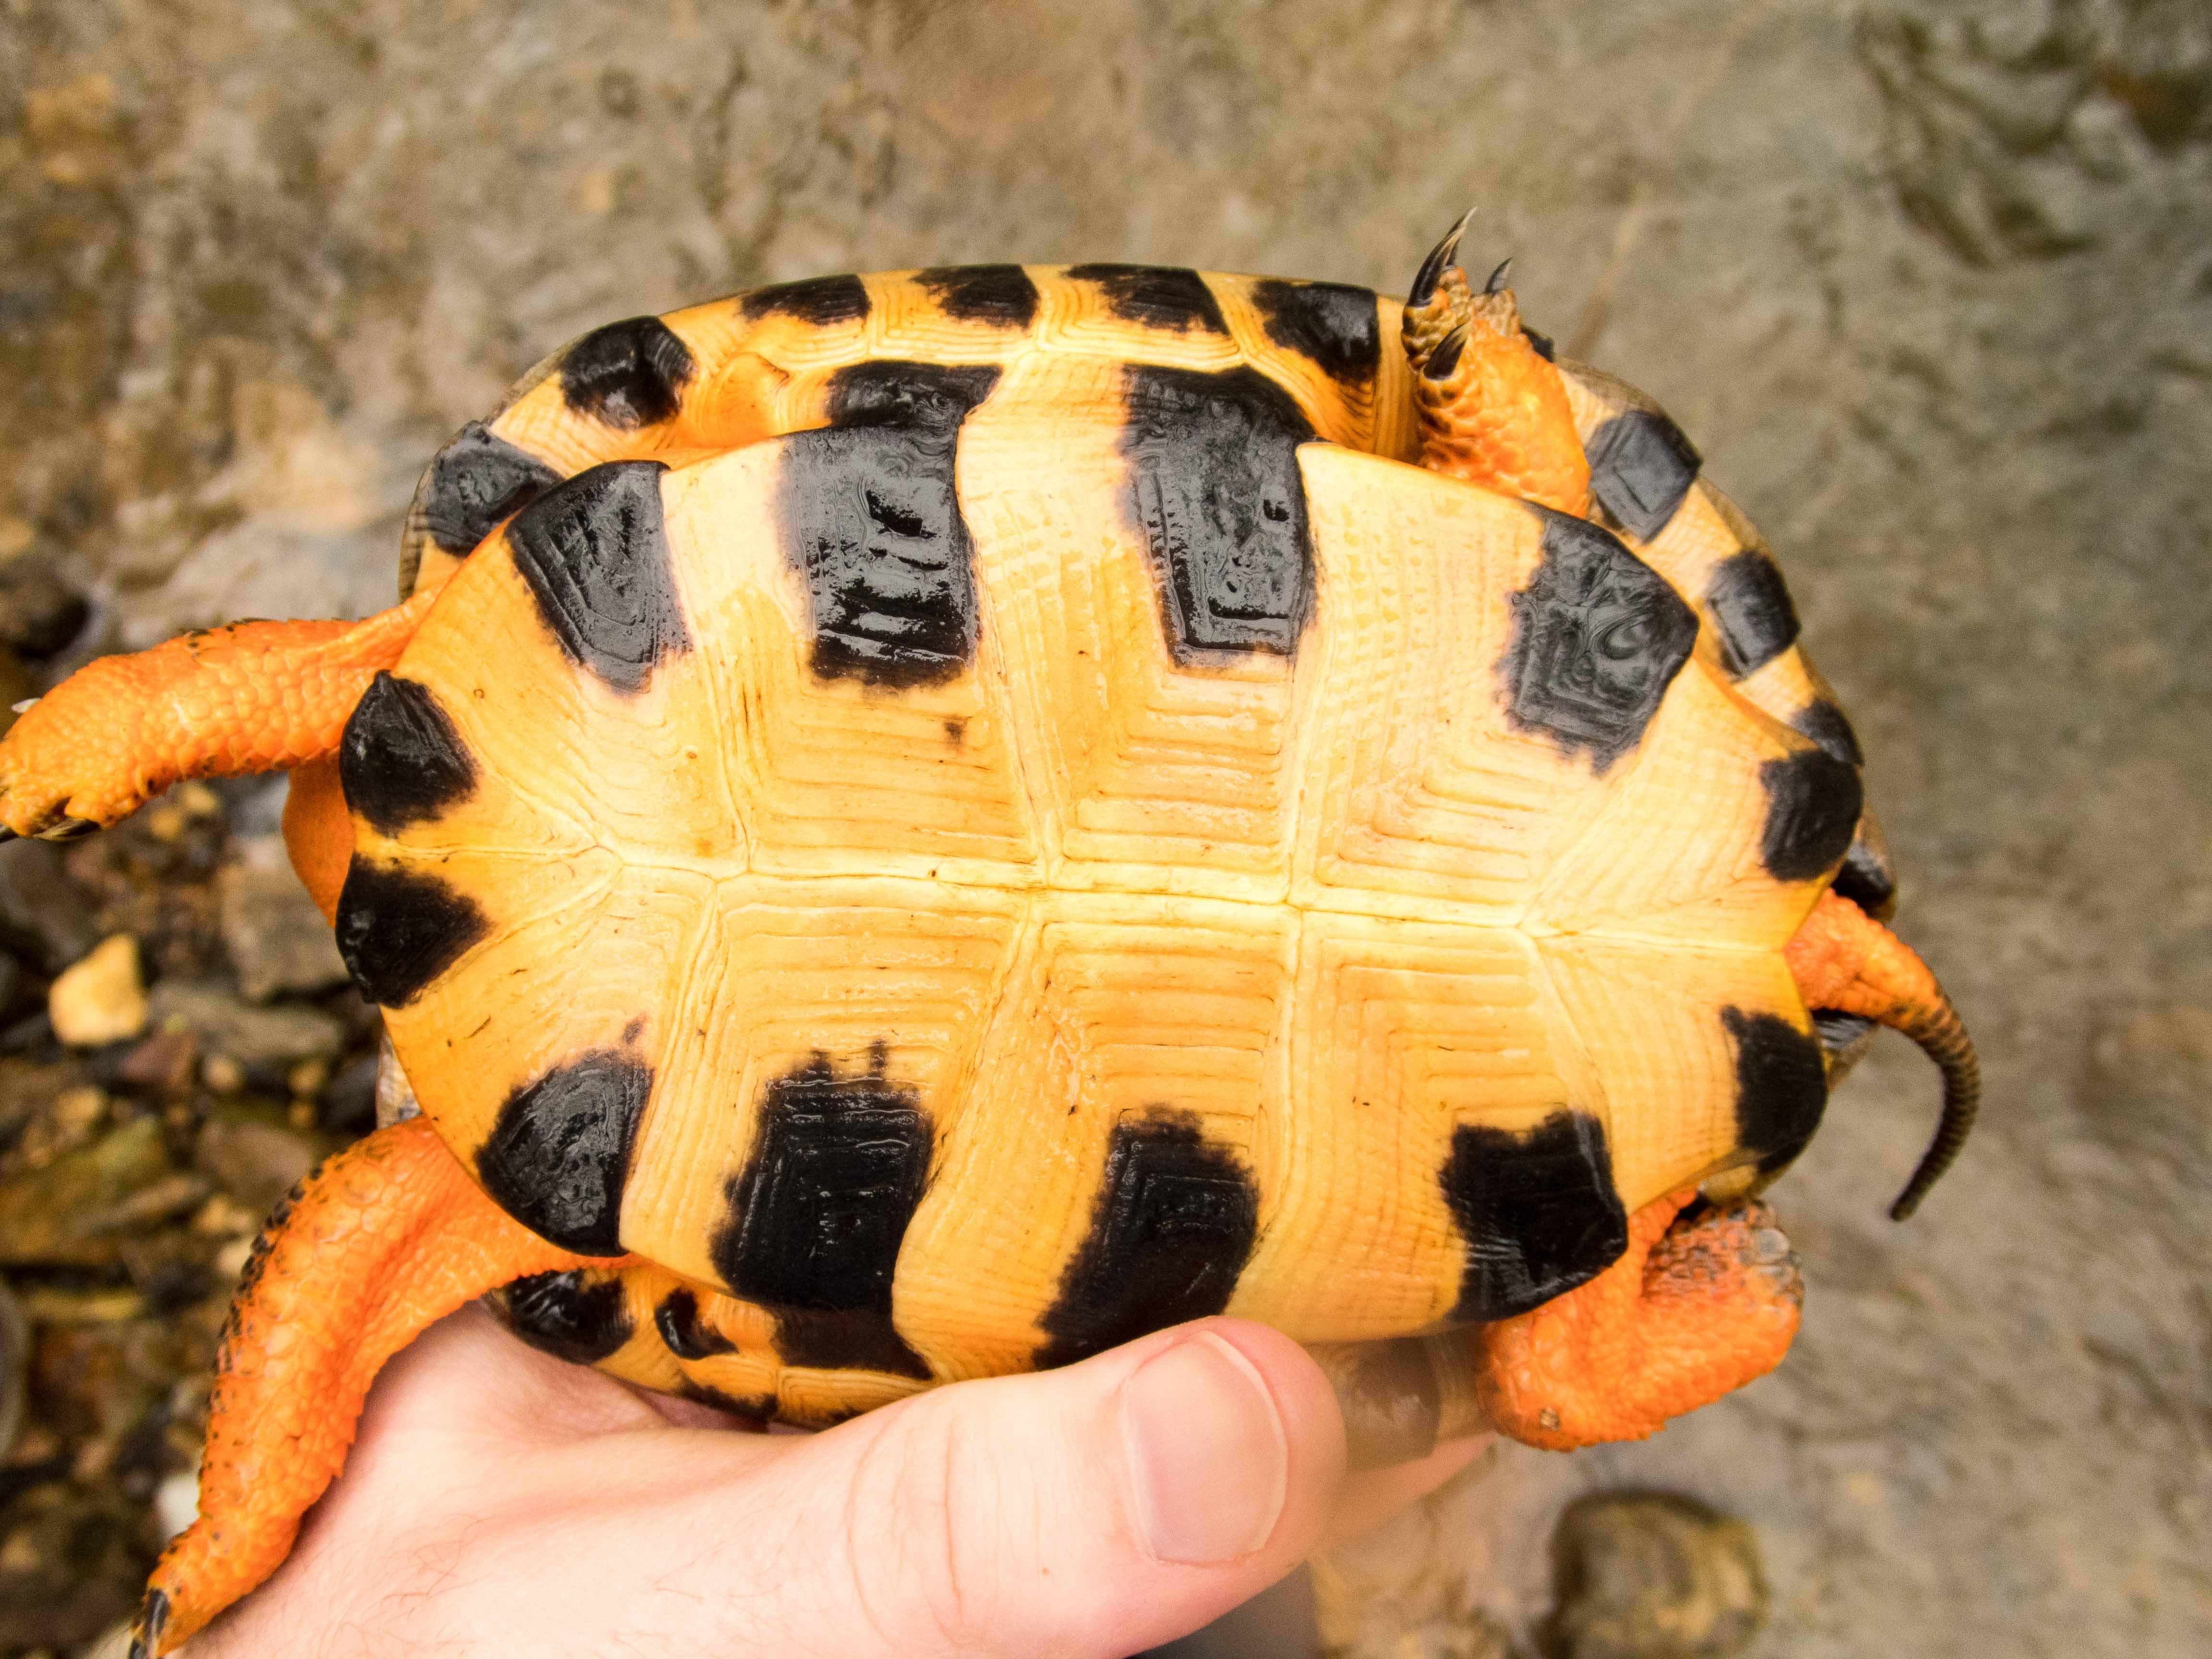 Sub-adult Glyptemys insculpta (Wood Turtle), Lebanon County, PA